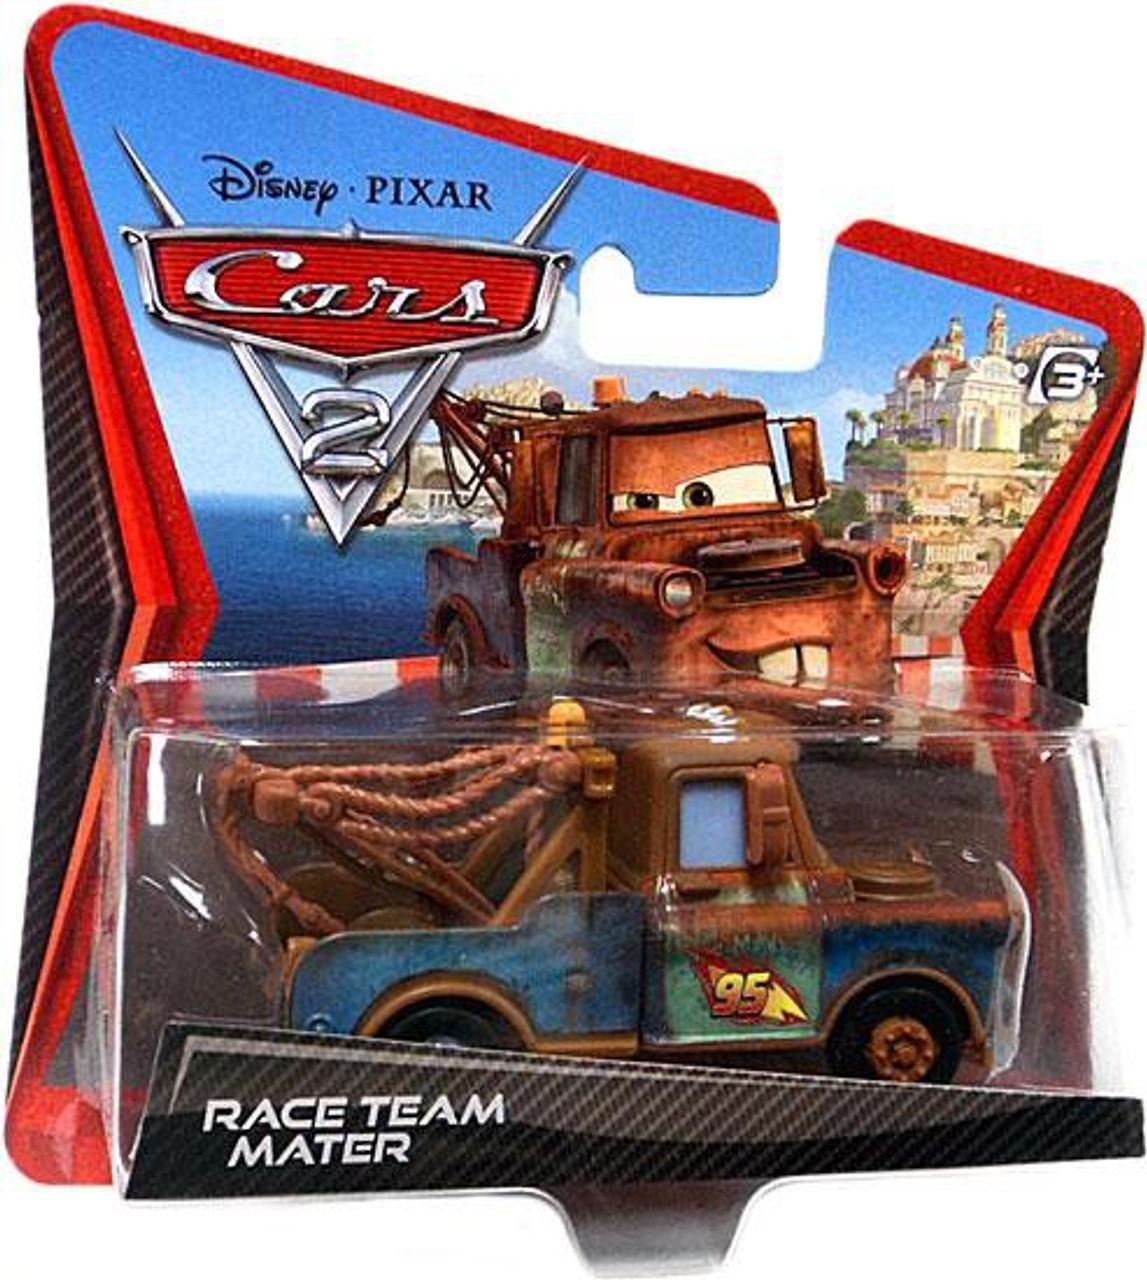 Disney Cars Cars 2 Main Series Race Team Mater Diecast Car [Checkout Lane Packaging]